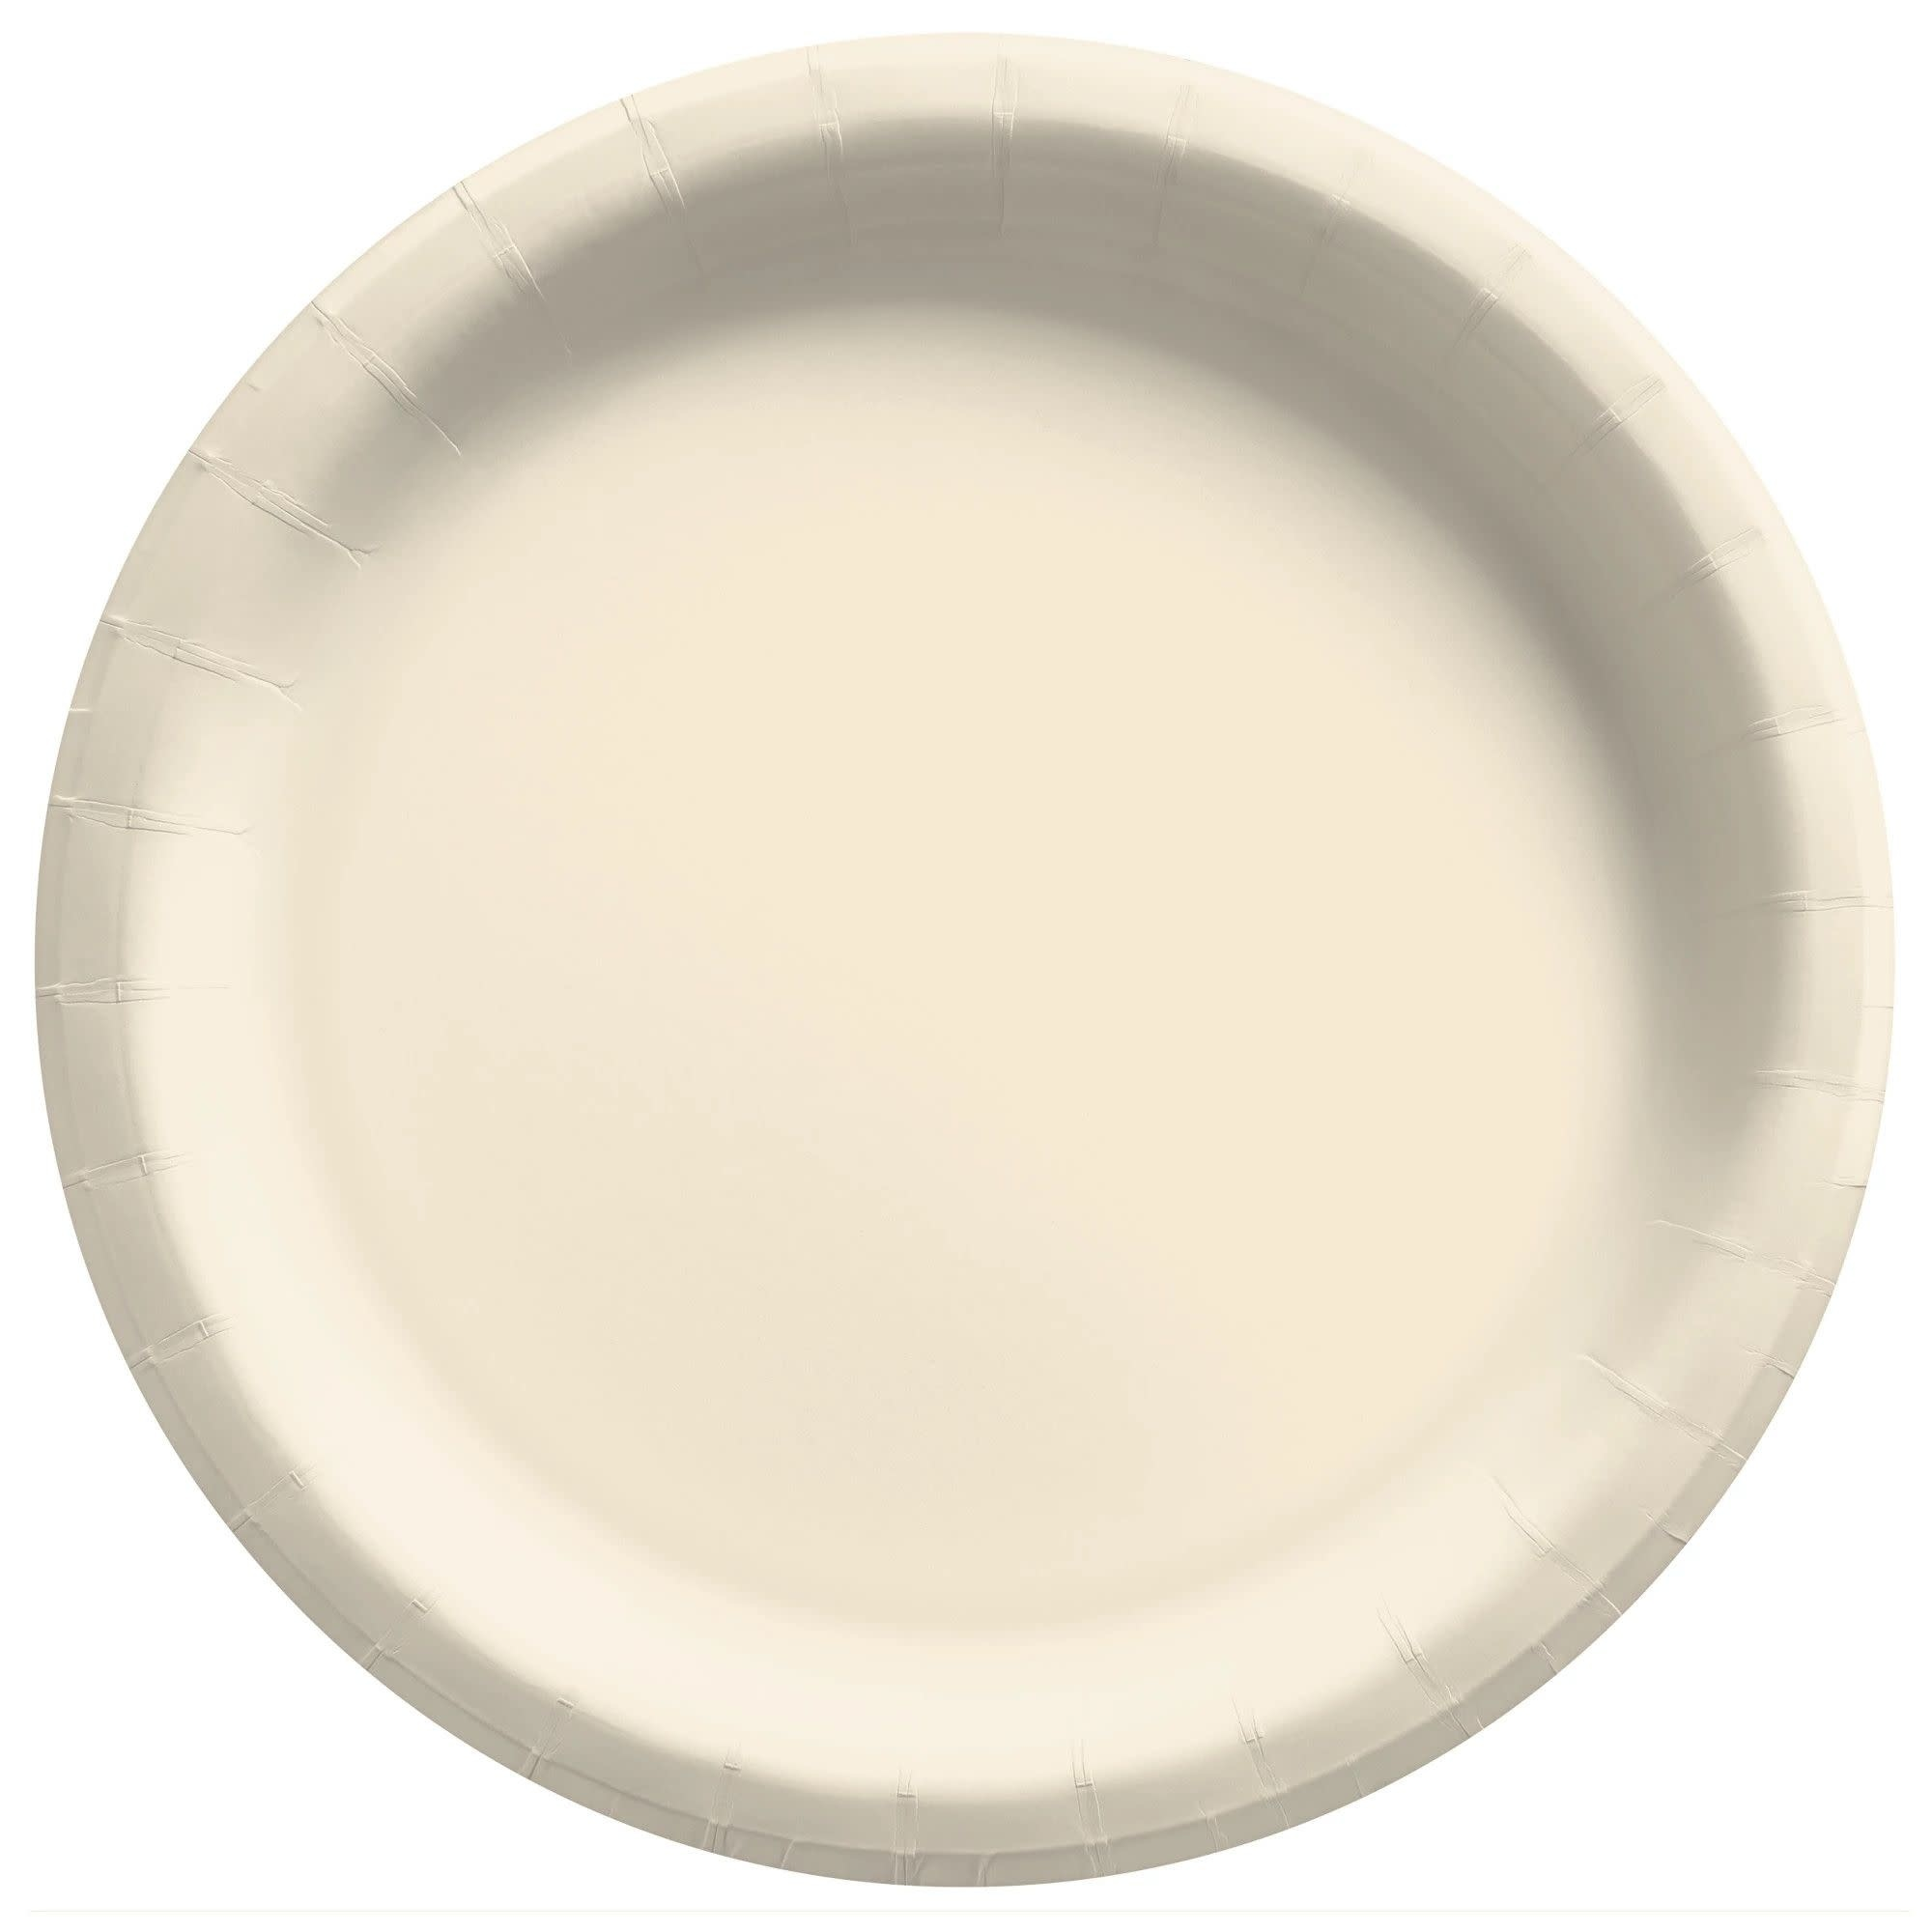 "8 1/2"" Round Paper Plates, Mid Ct. - Vanilla Creme"